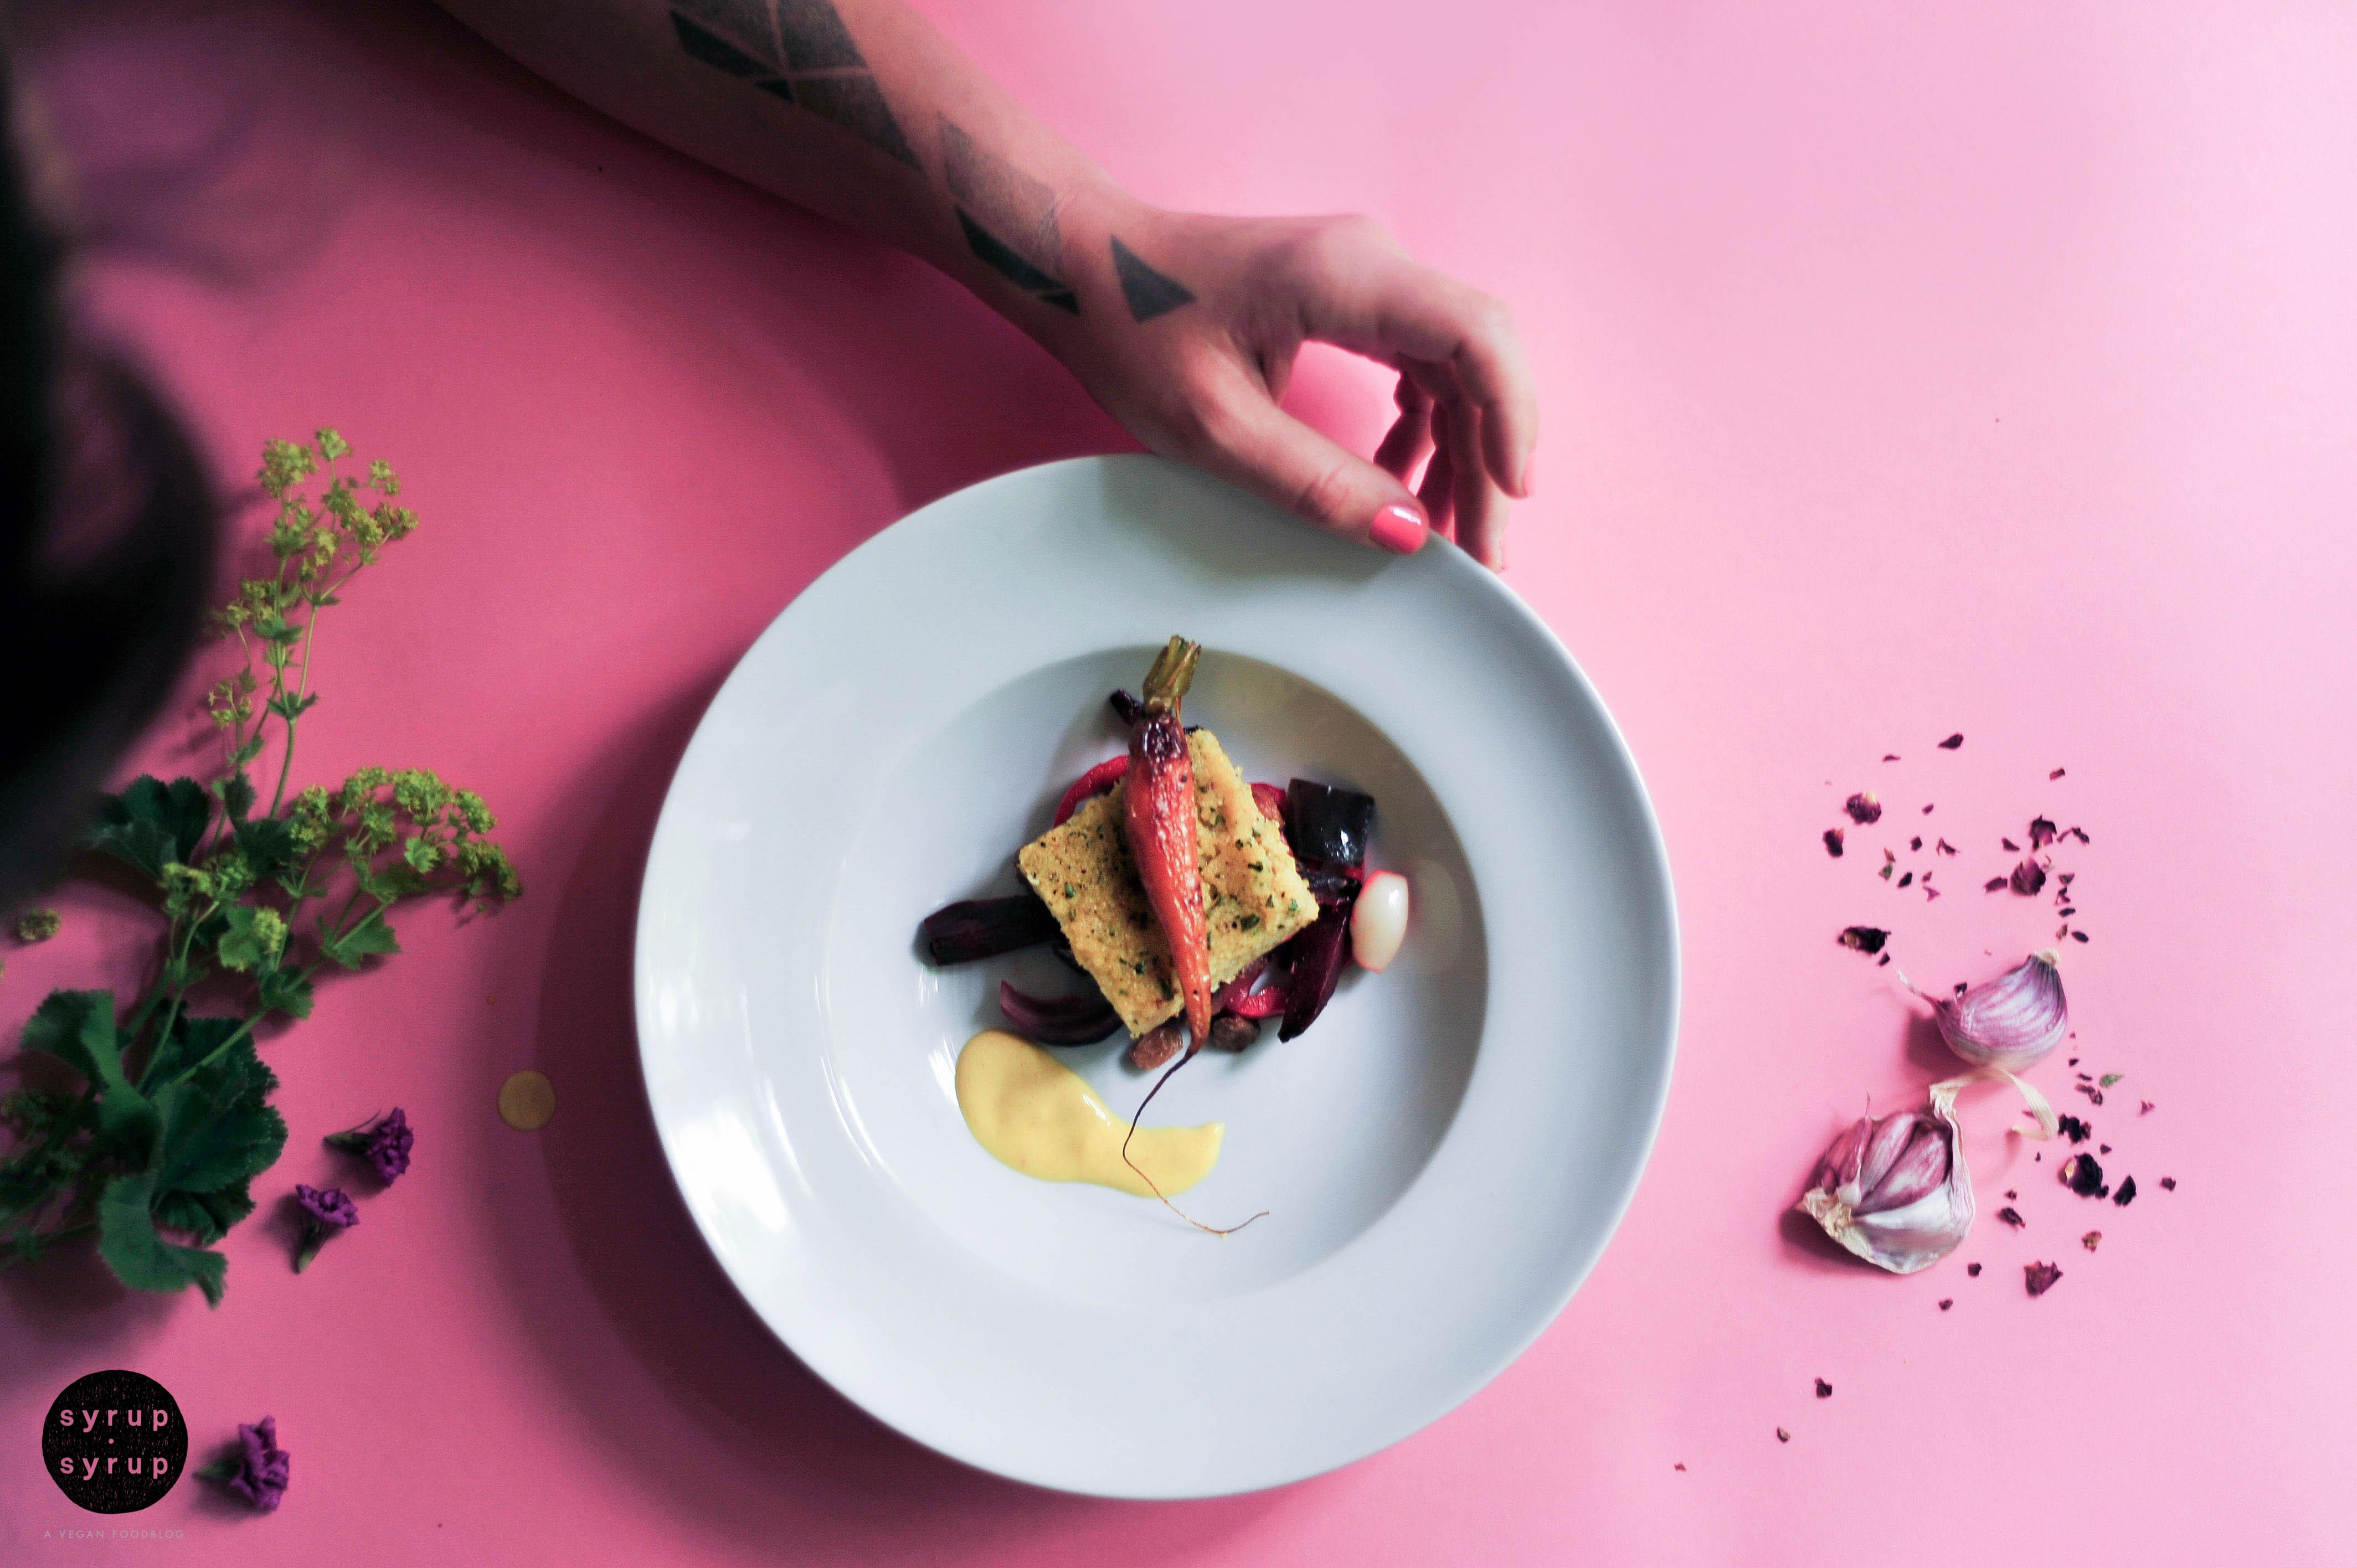 paella ofengemuese vegan 01 - Koriander-Polenta mit Wurzelgemüse